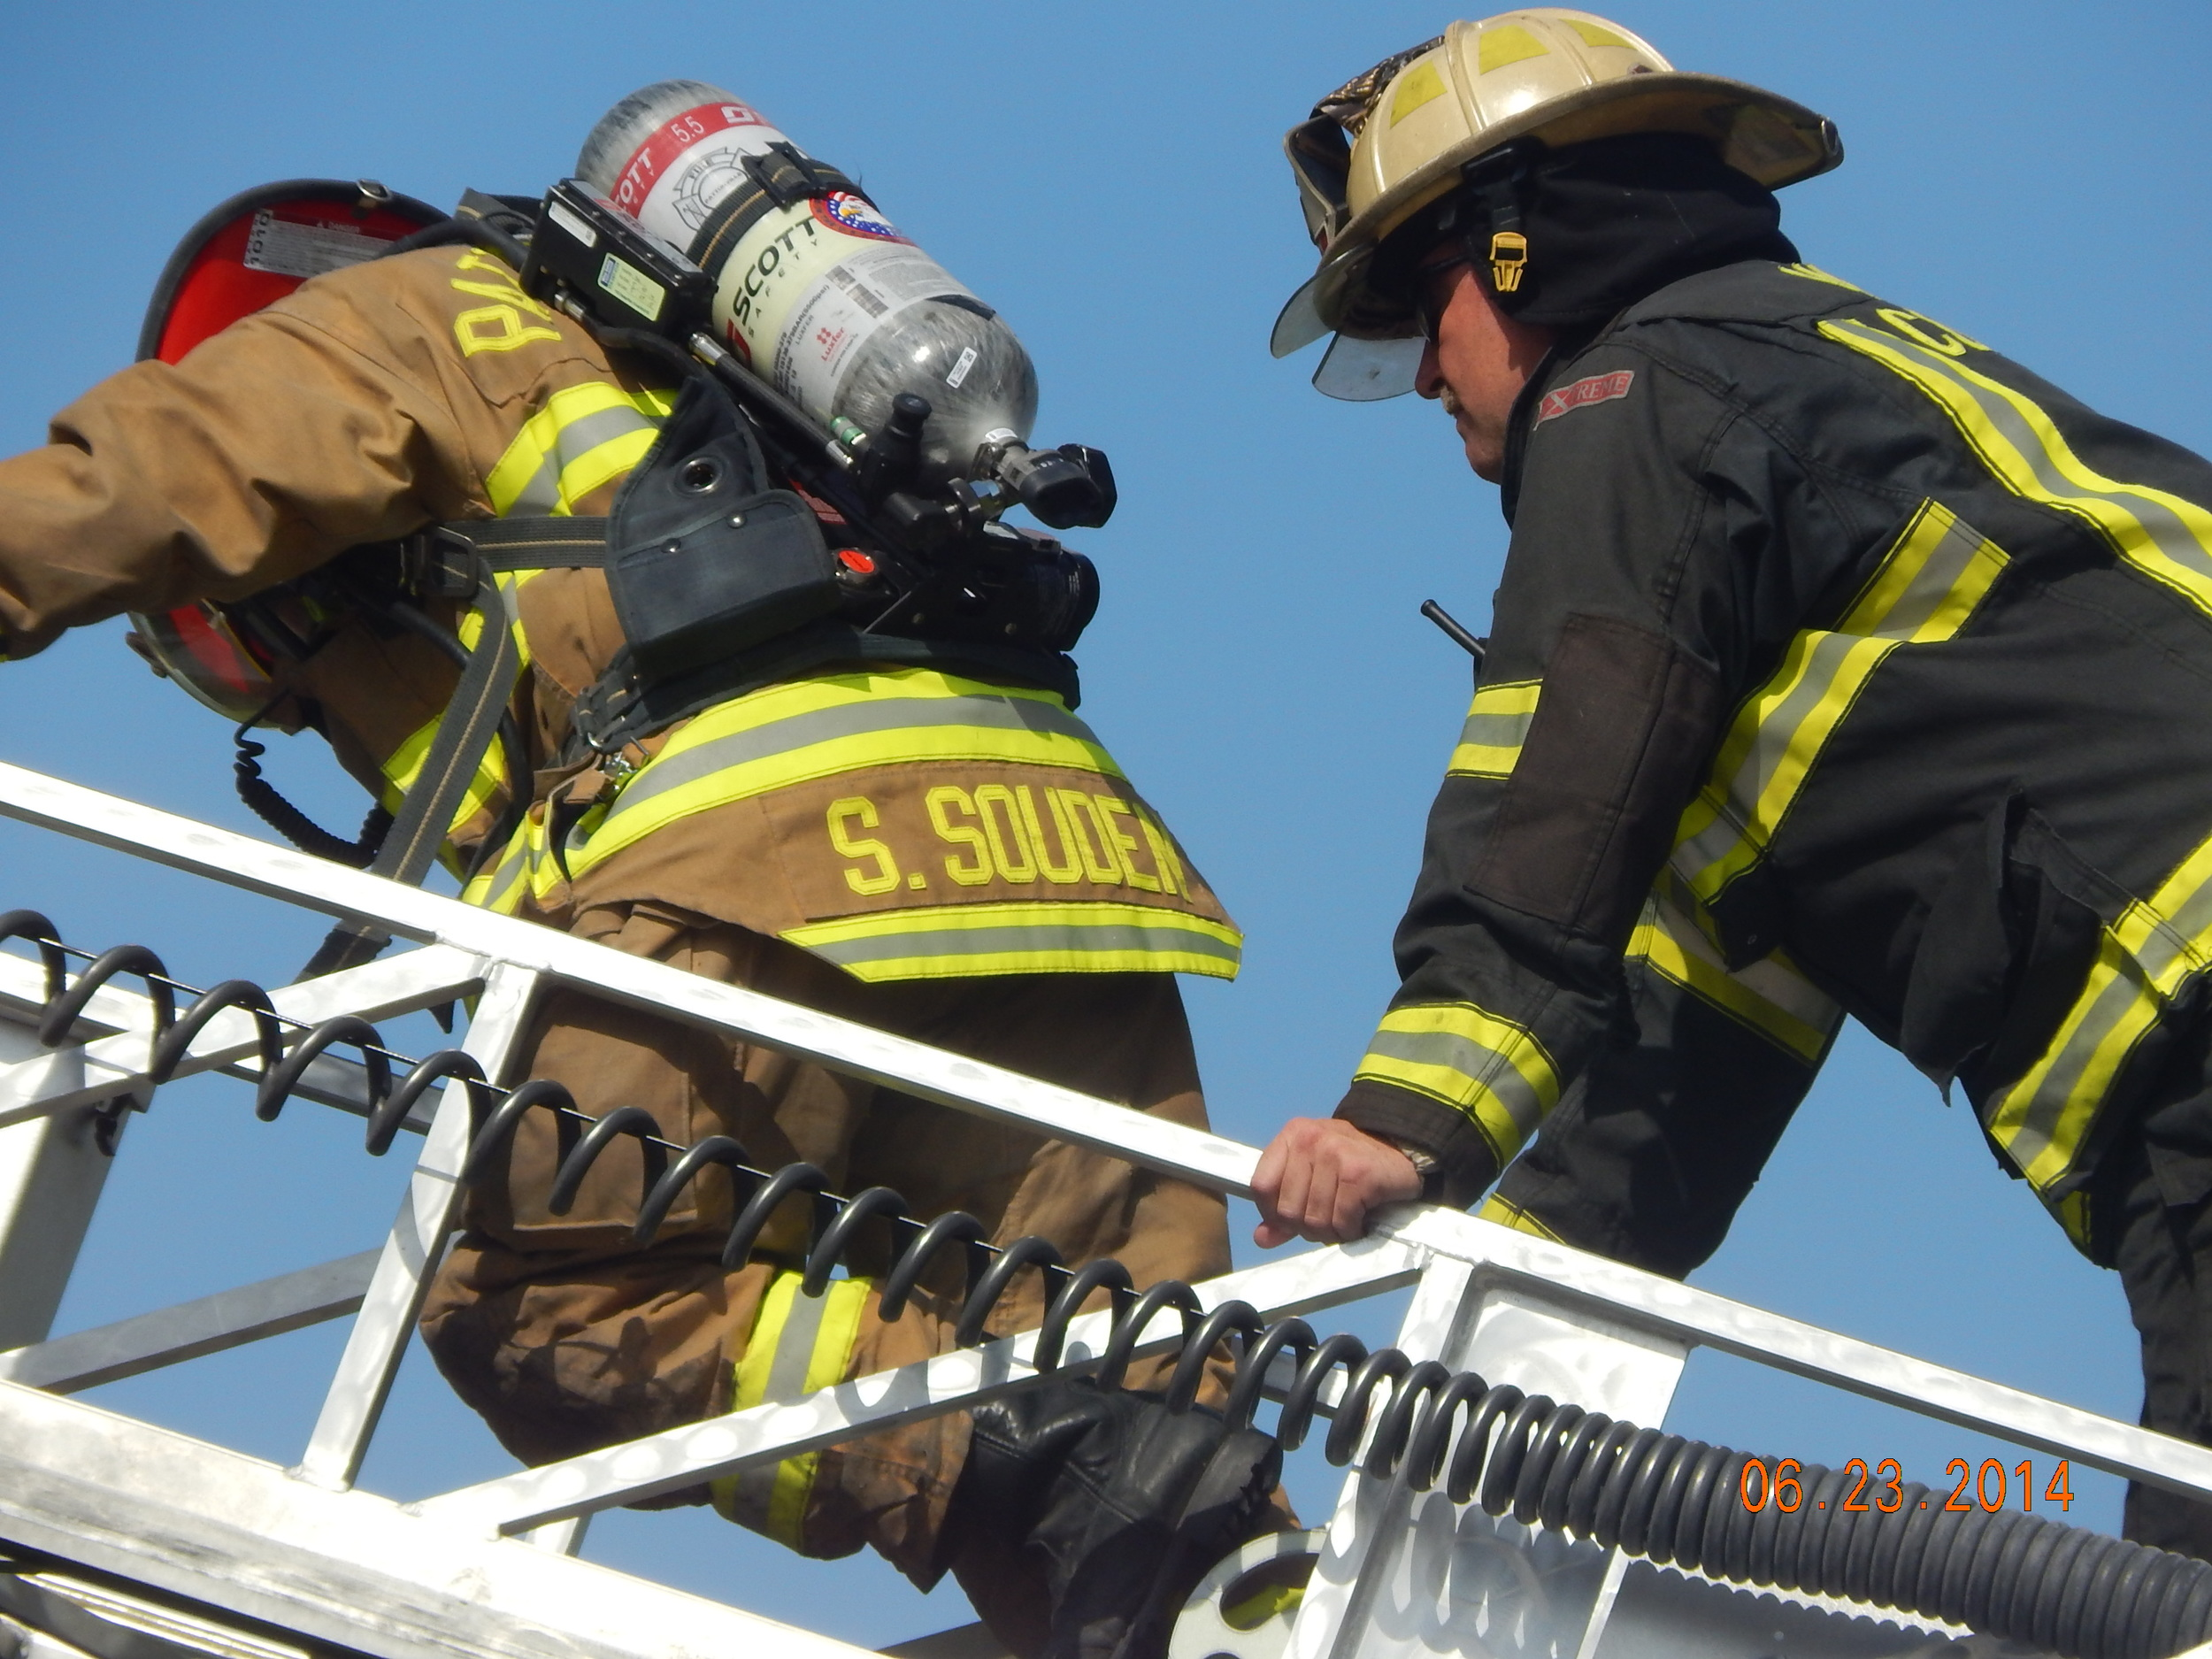 1st Alarm POM Training 06-23-14 133.JPG